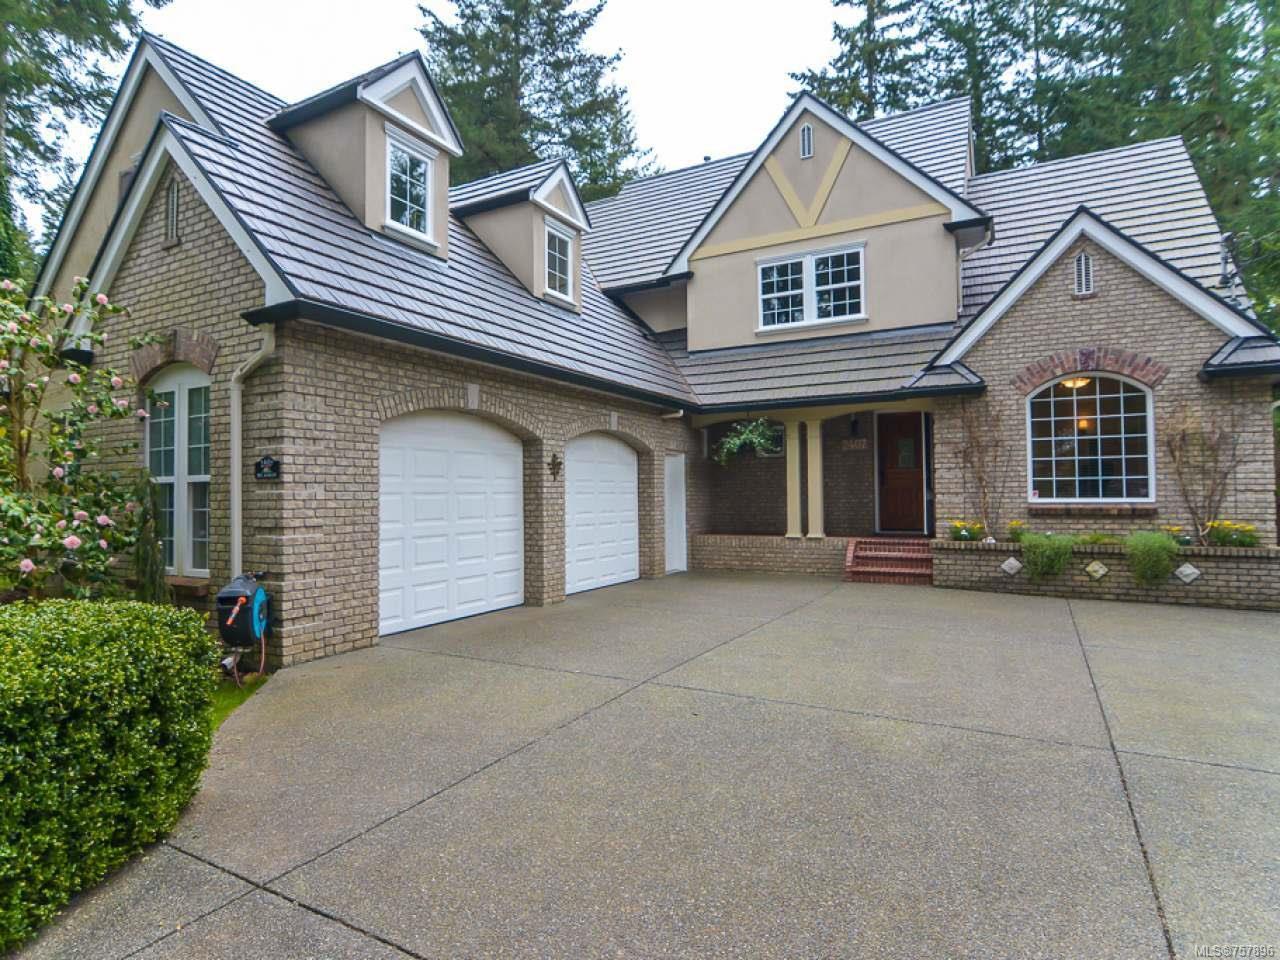 Main Photo: 2407 DESMARAIS PLACE in COURTENAY: CV Courtenay North House for sale (Comox Valley)  : MLS®# 757896